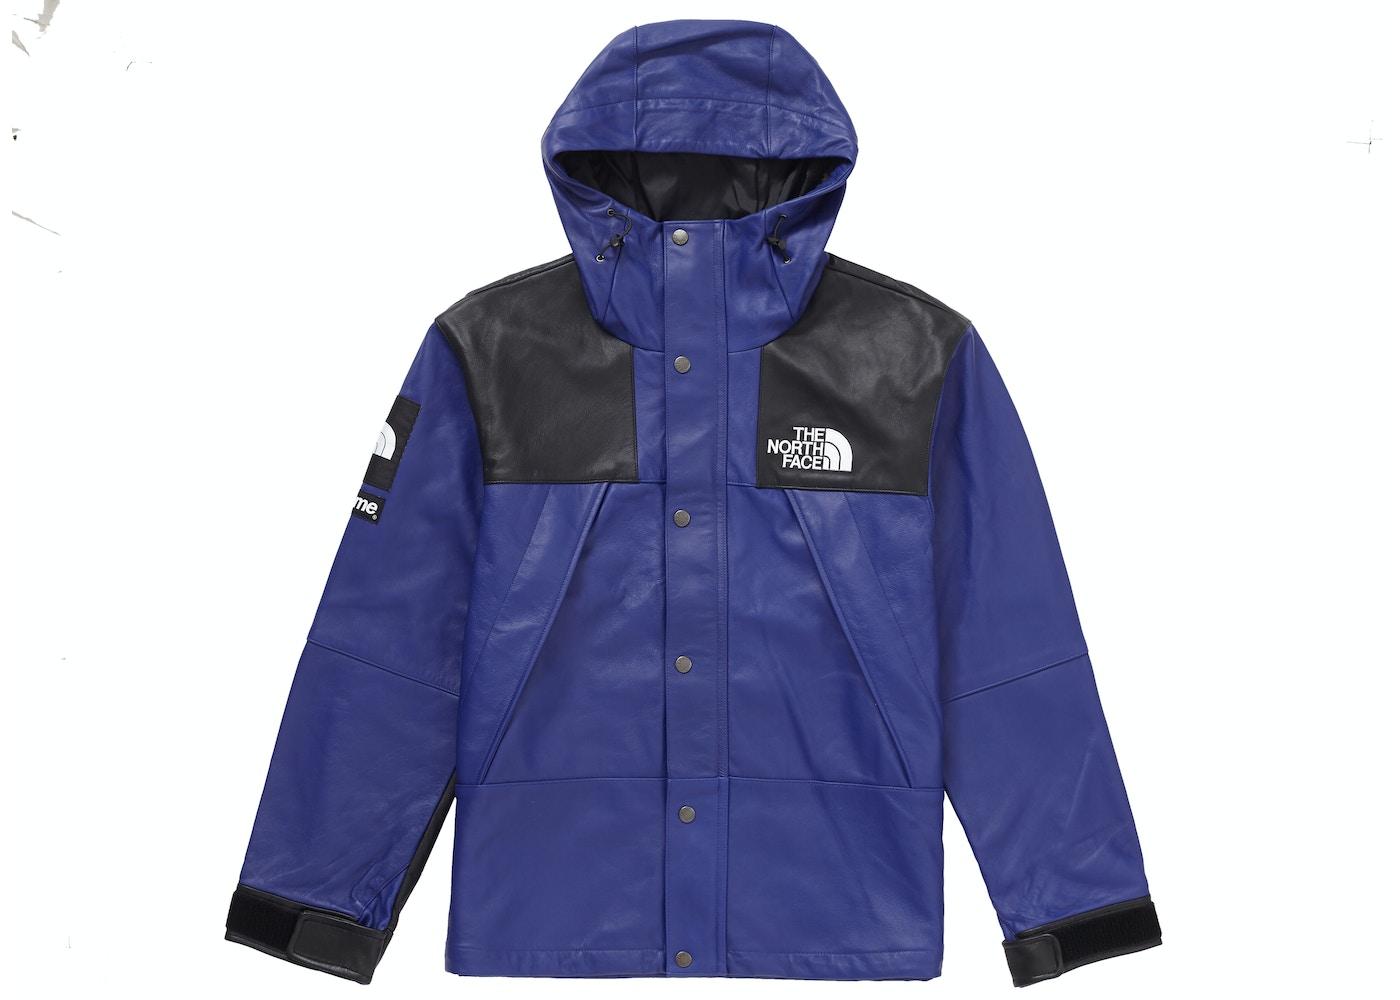 e68dd9ac8 Buy & Sell Streetwear - Supreme, Bape, Palace, Kith